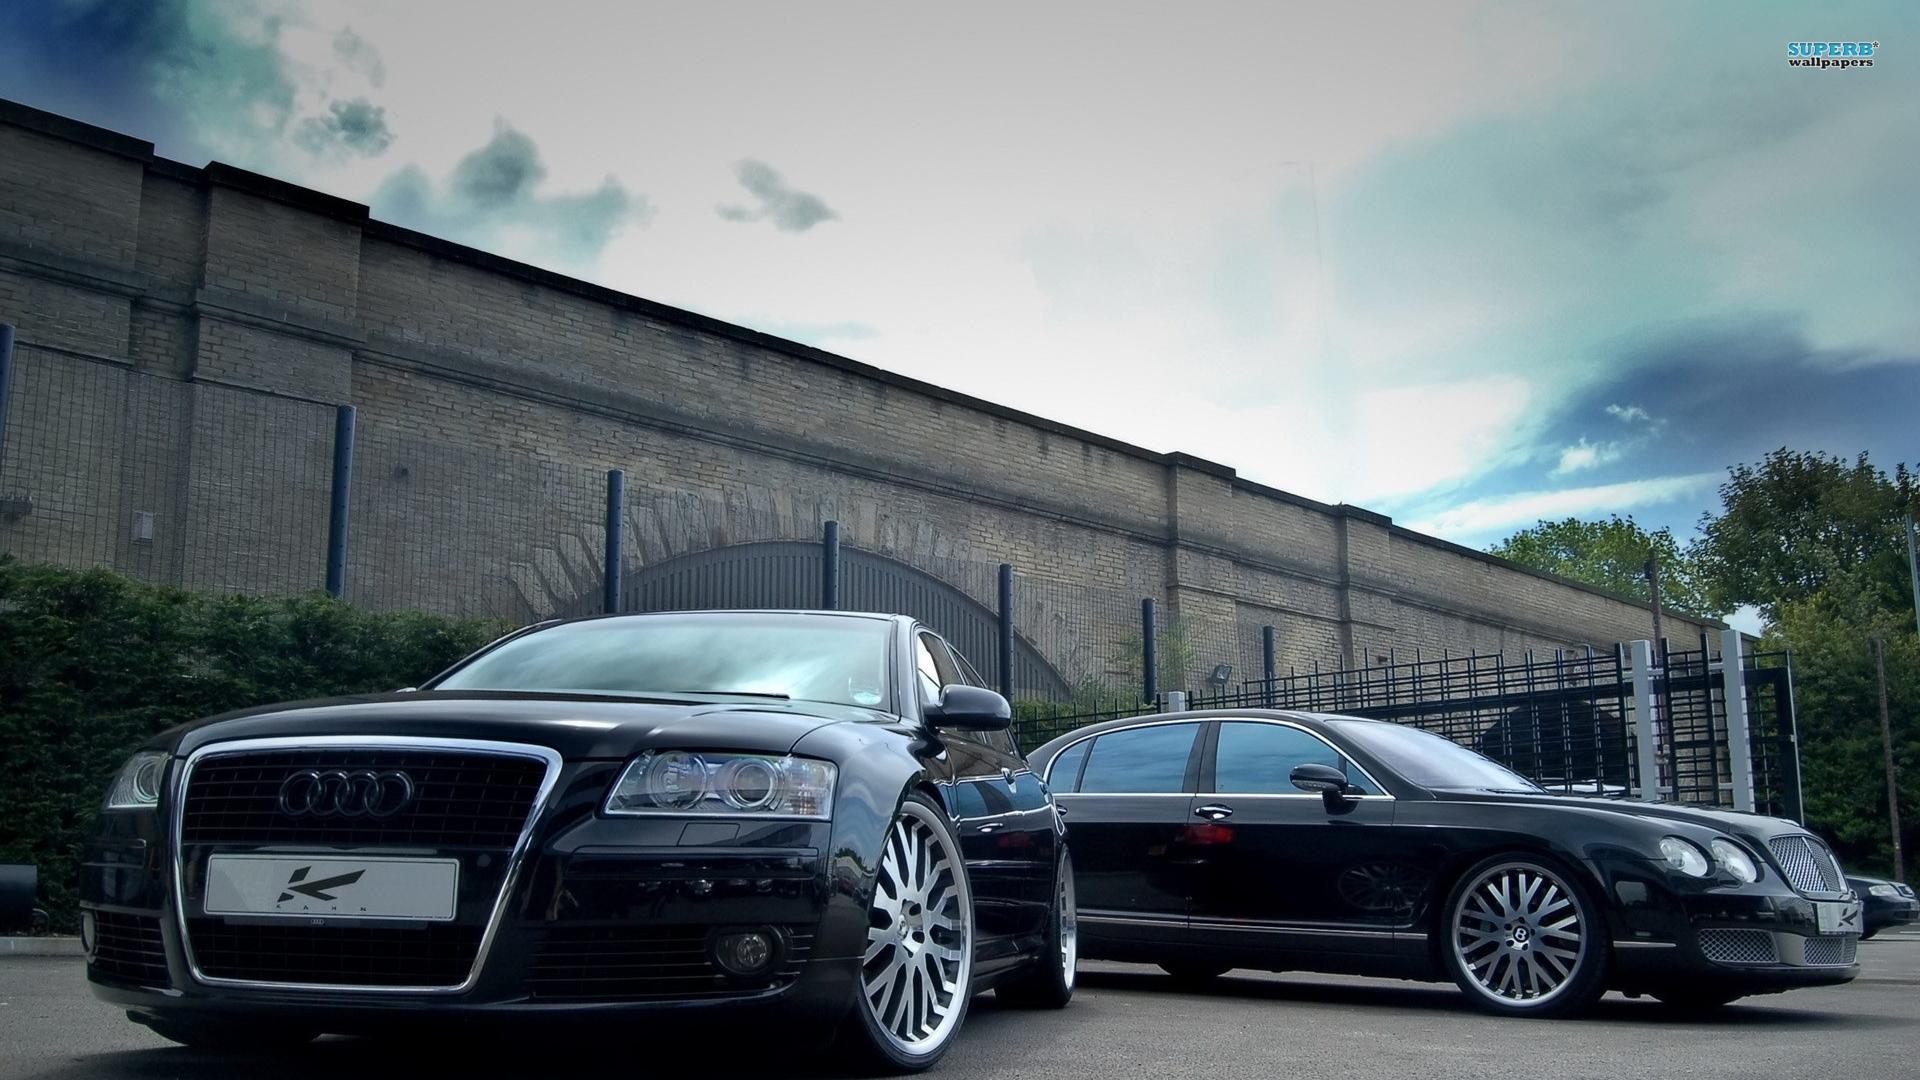 Audi A8 Wallpapers 1920x1080 2173810   HD Wallpaper 1920x1080